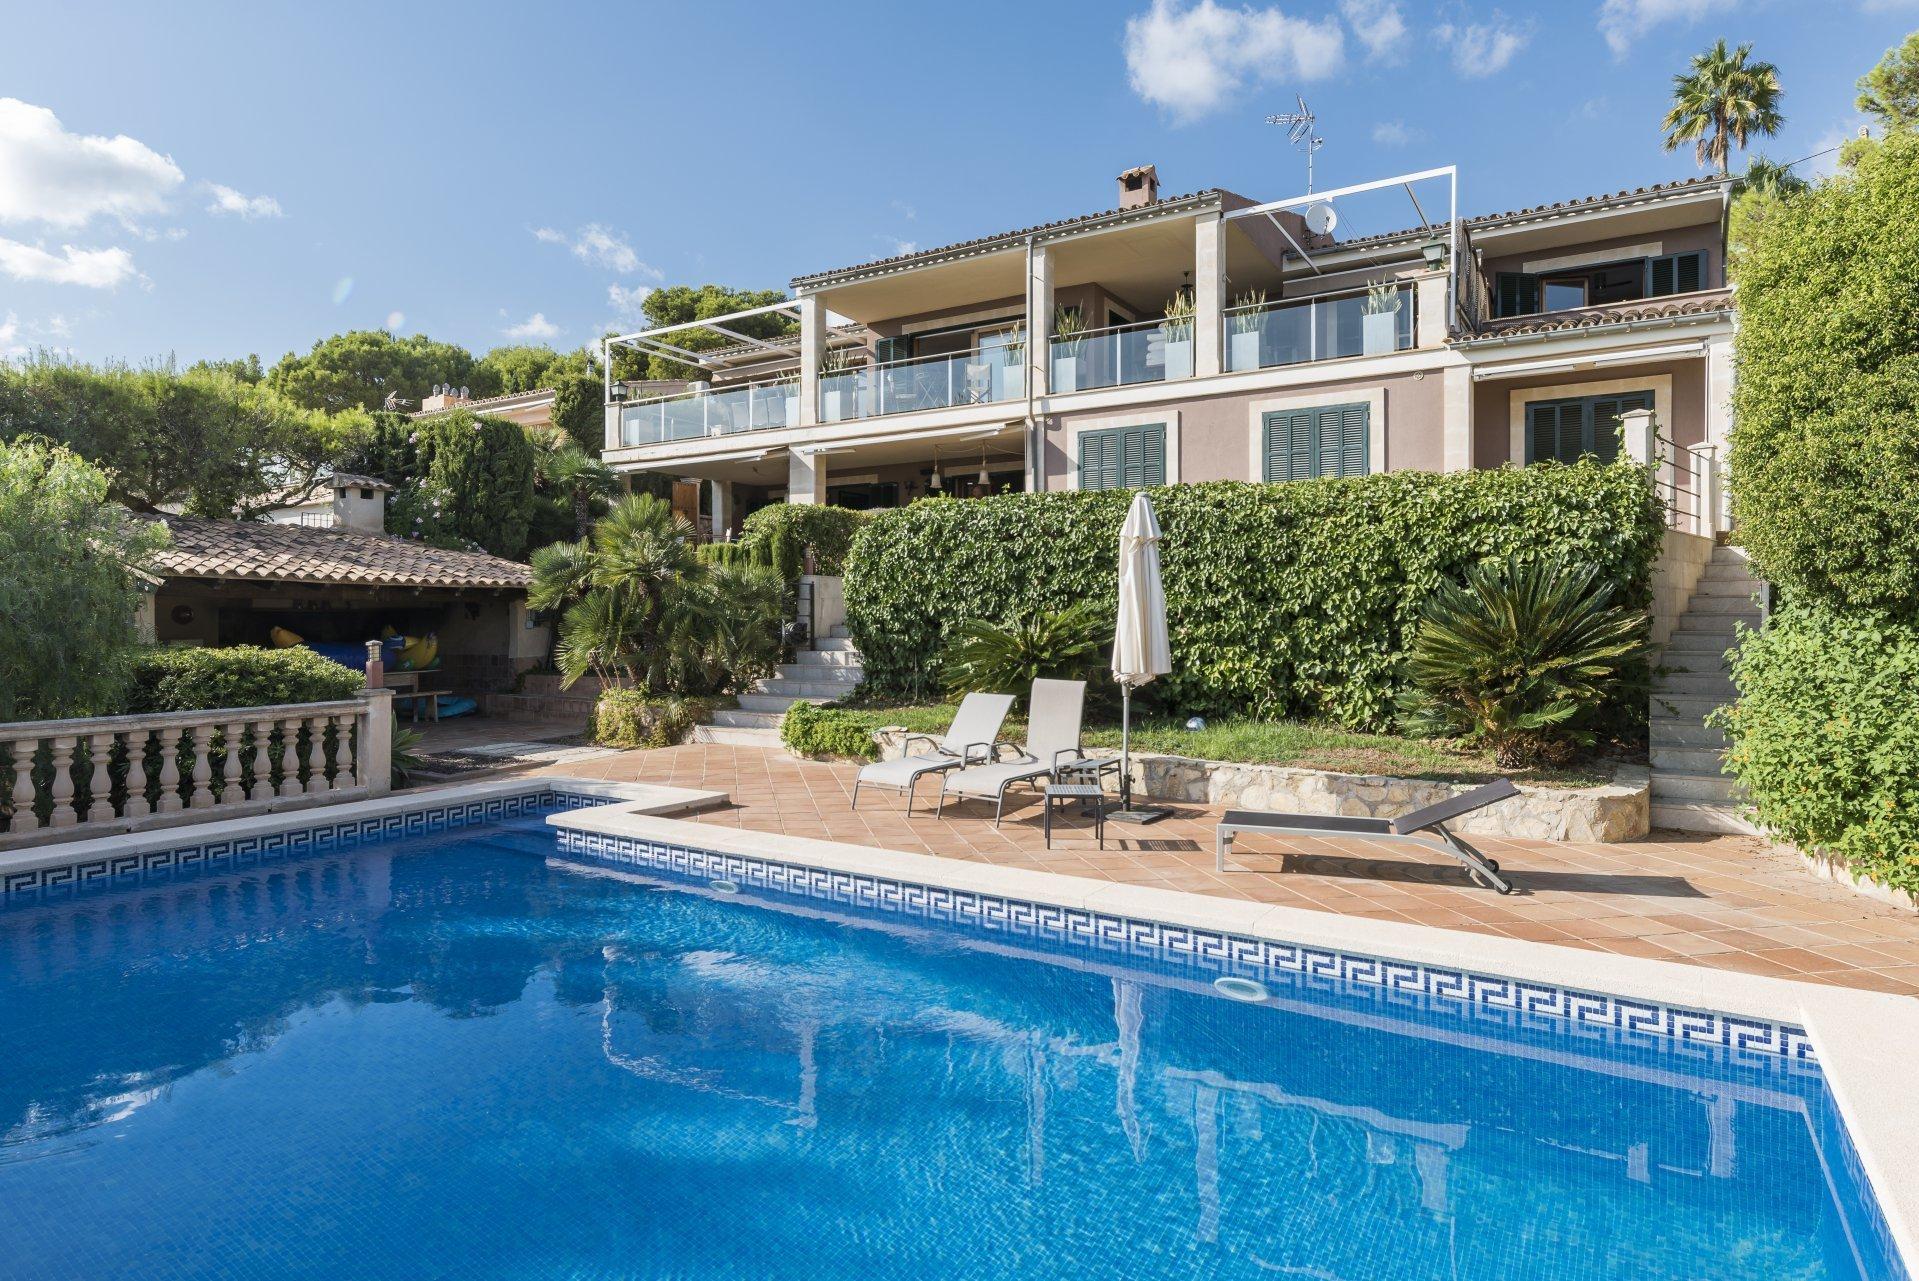 Villa in Bendinat, Balearic Islands, Spain 1